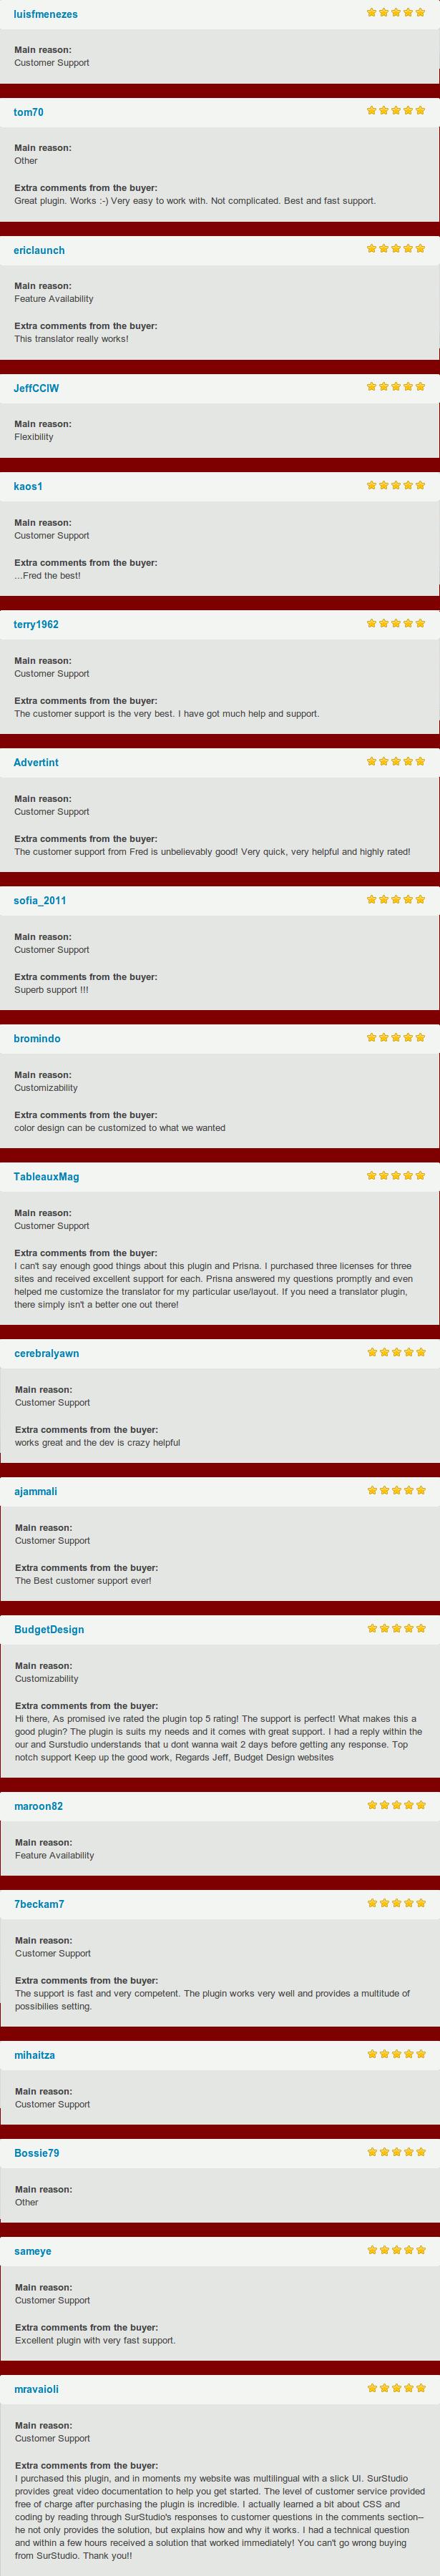 1sf مردان ezes پشتیبانی مشتریان اصلی دیگر نظرات اضافی از پلاگین بزرگ.  این نسخهها کار میکند کار بسیار آسان با.  پیچیده نیست.  بهترین و پشتیبانی سریع می باشد.  ericlaunch اصلی Avaiiability ویژگی نظرات اضافی را از آثار این مترجم realiy!  kaosl JeffCCIW اصلی انعطاف پذیری اصلی پشتیبانی مشتریان نظرات اضافی را از فرد بهترین های اصلی پشتیبانی مشتریان نظرات اضافی را از پشتیبانی مشتری بهترین.  کمک و پشتیبانی بسیار کردم.  Advertint اصلی پشتیبانی مشتریان نظرات اضافی را از پشتیبانی مشتری از فرد unbeiievabiy بسیار سریع است.  نظرات اضافی بسیار helpfui و اصلی highiy پشتیبانی مشتریان از پشتیبانی عالی دوم!  bromindo اصلی Customizability نظرات اضافی از طراحی رنگ می تواند سفارشی چه می خواست